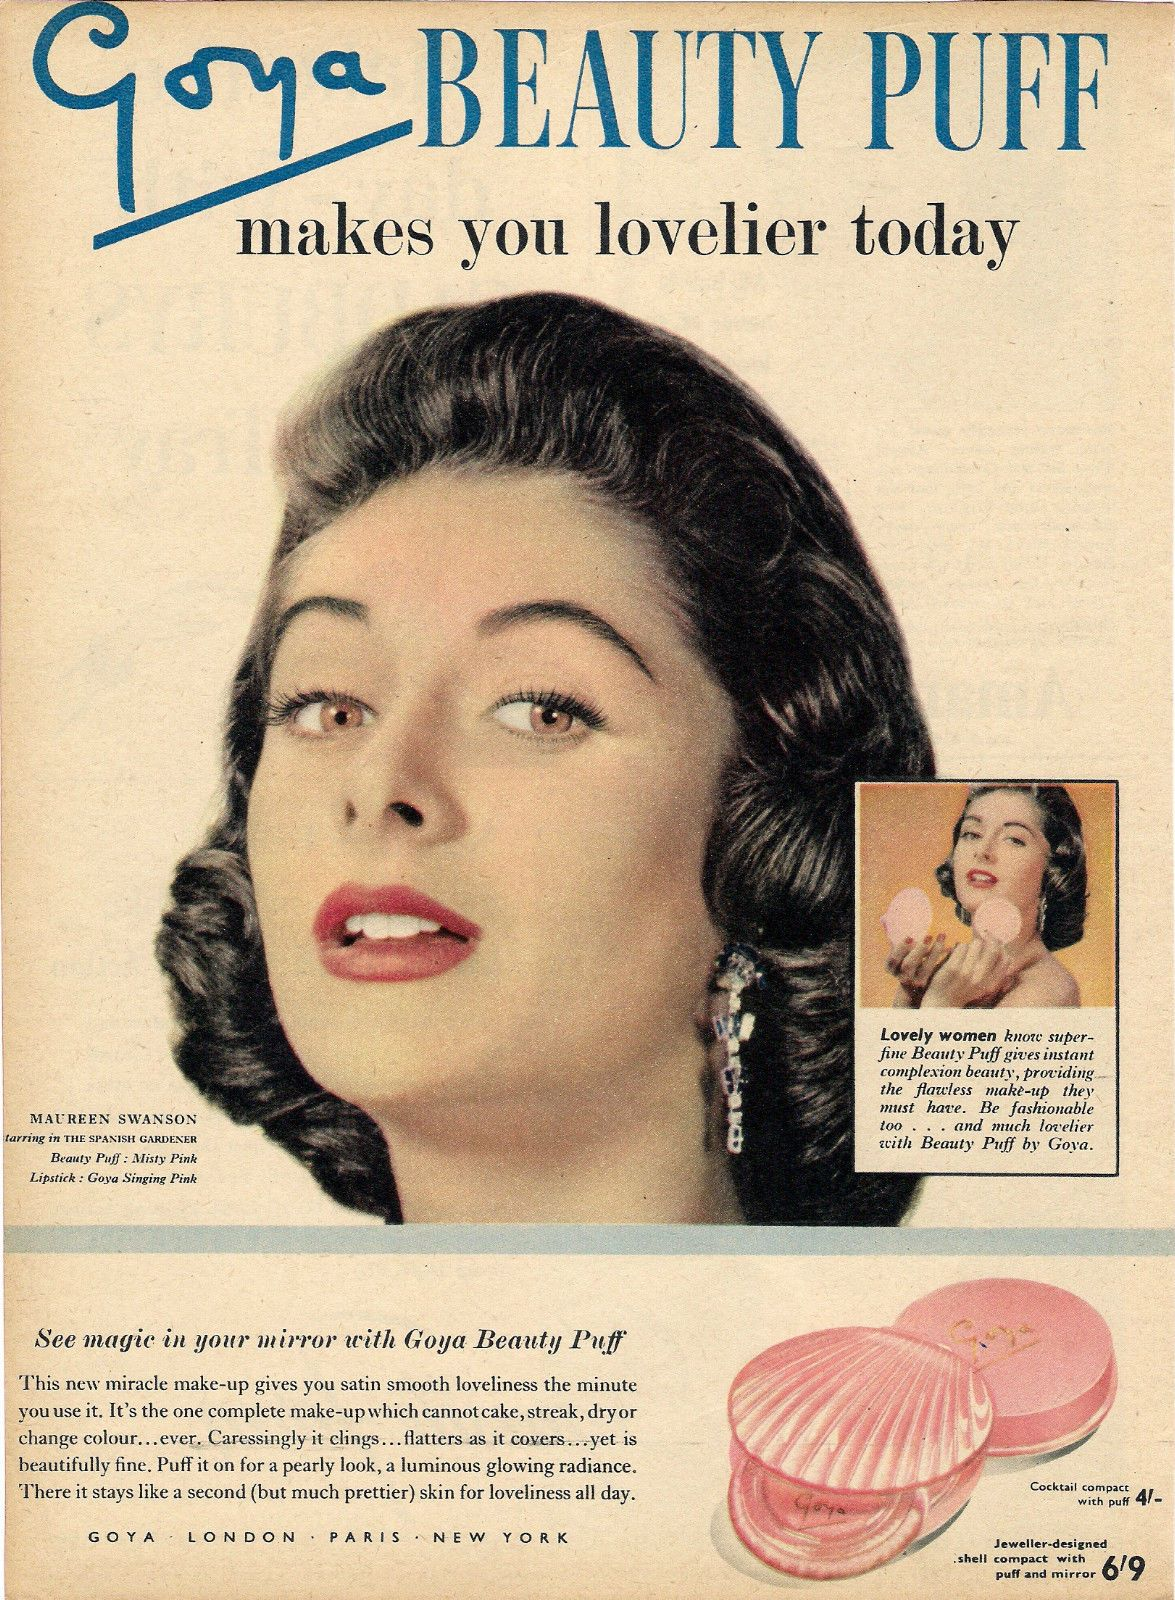 Goya 'Beauty Puff' Ad, 1950's Vintage makeup ads